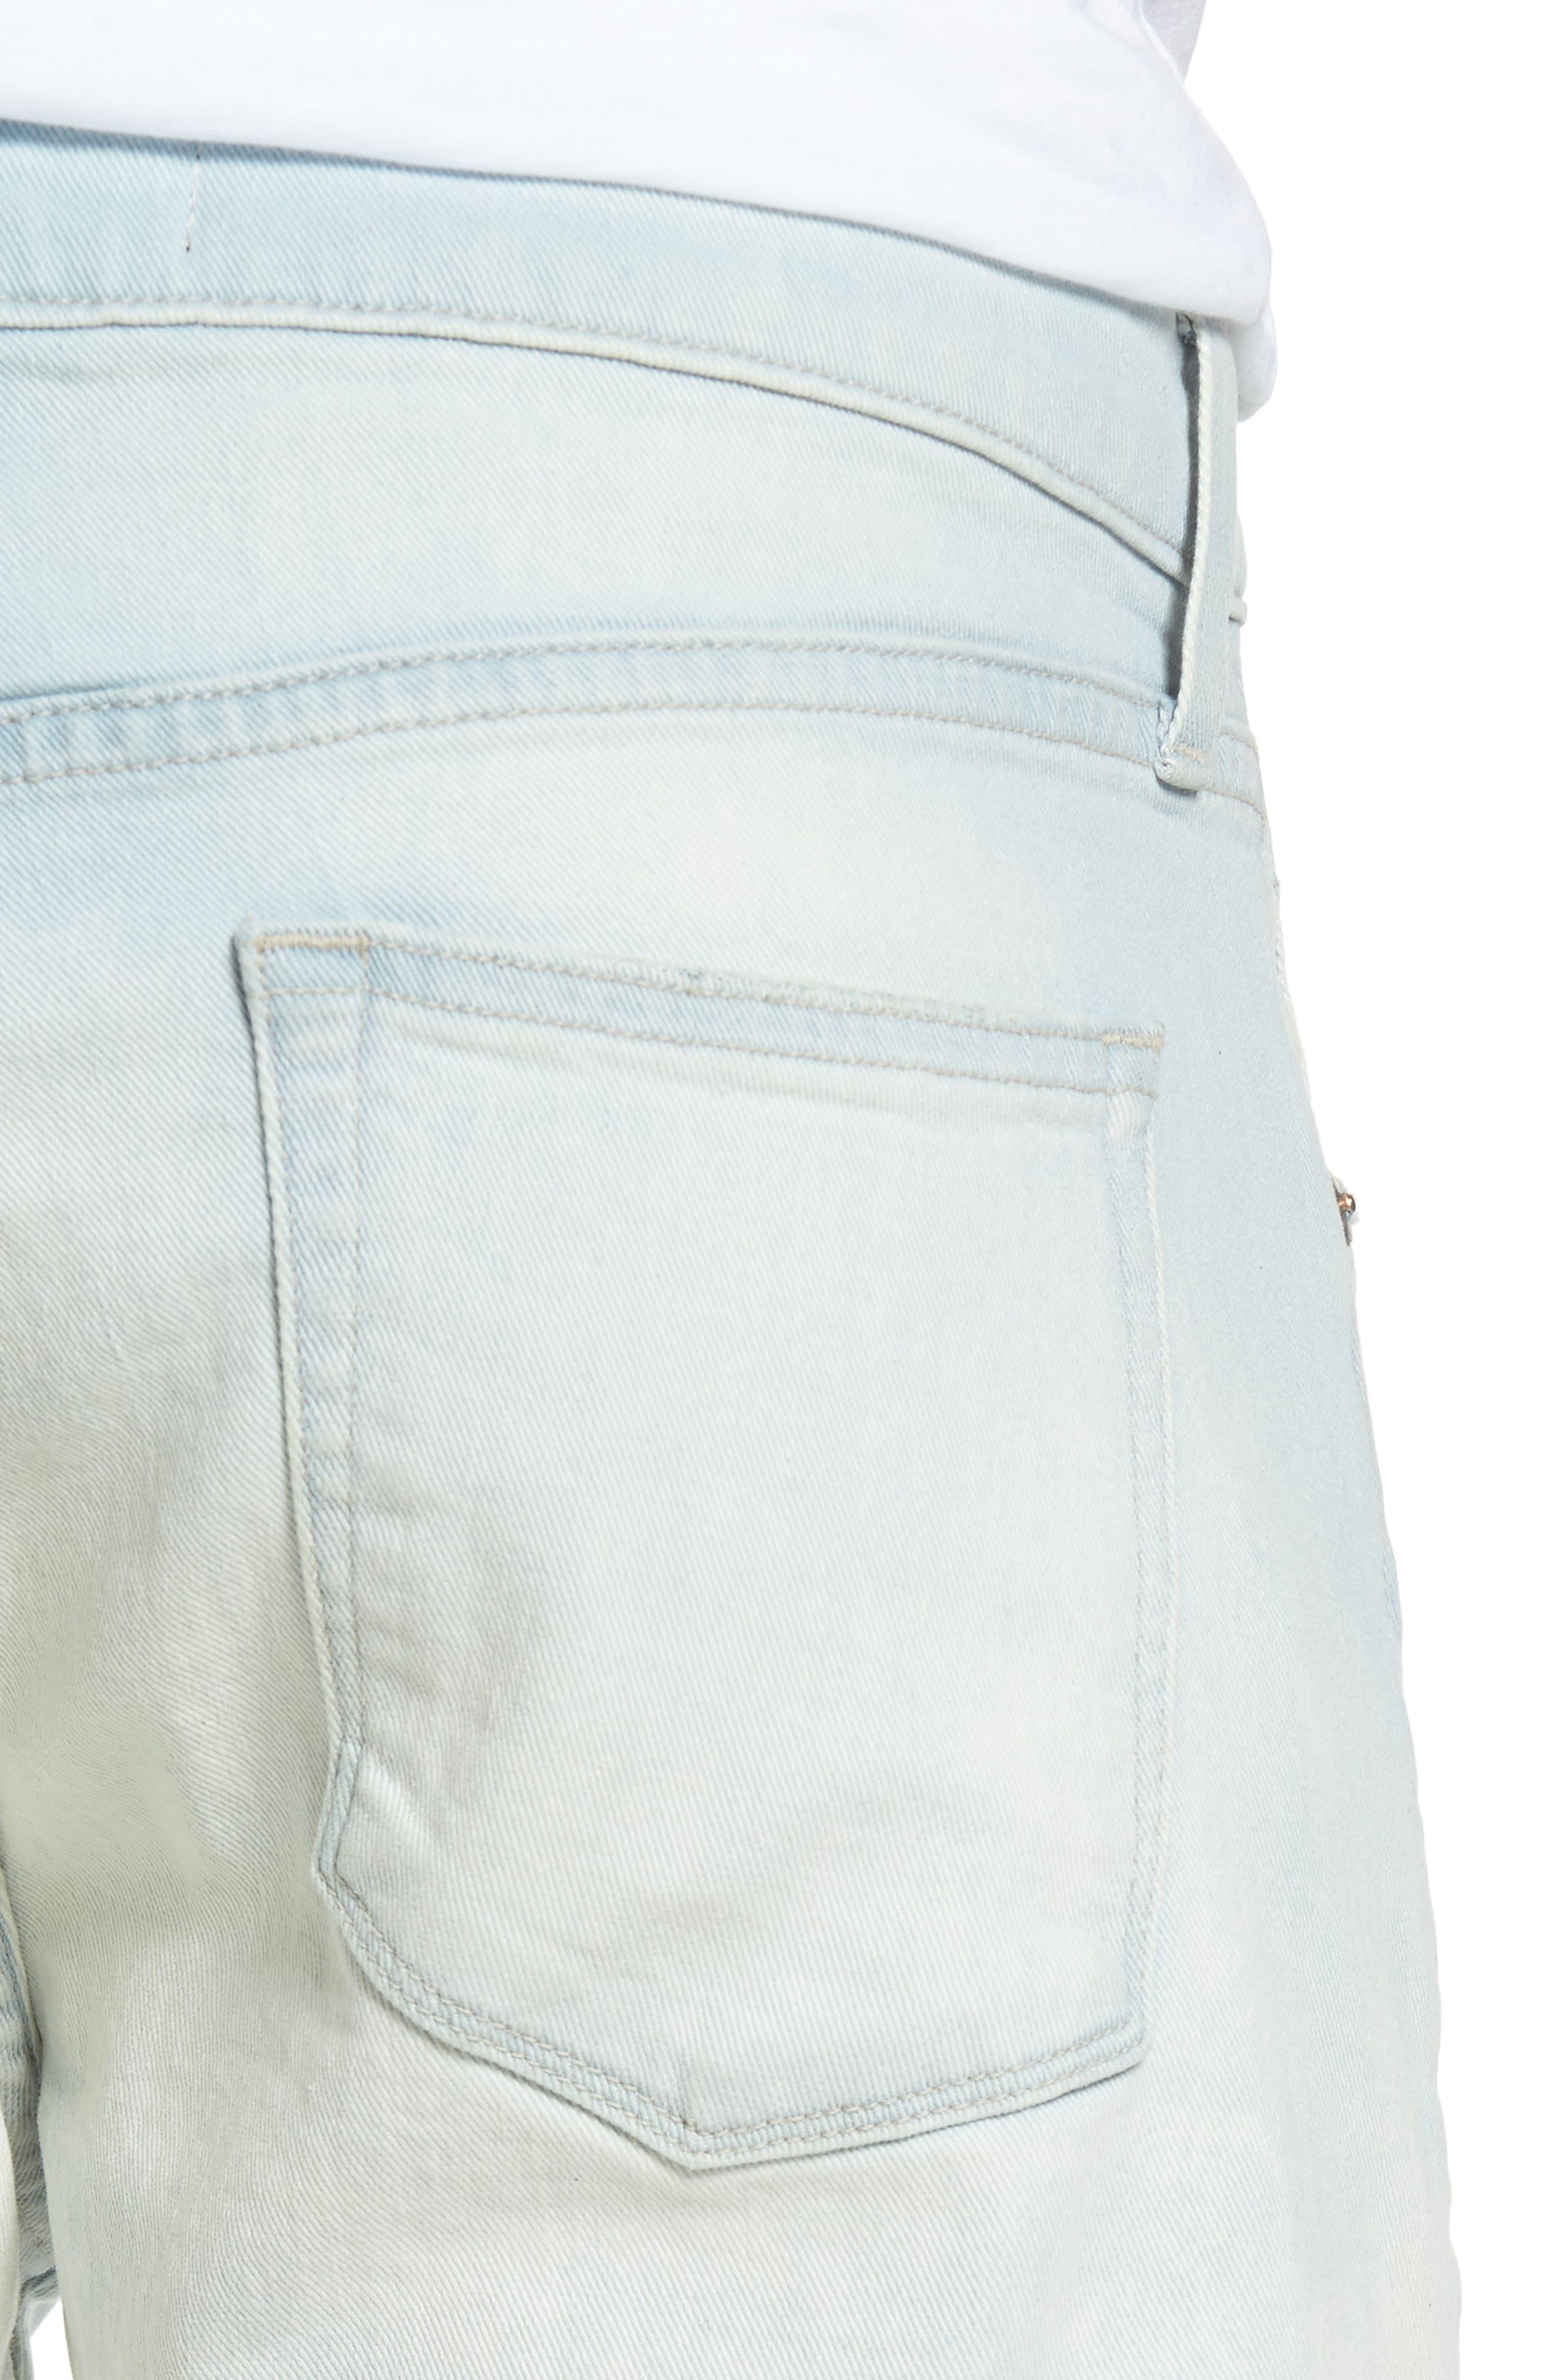 Tyler Slim Fit Jeans,                             Alternate thumbnail 4, color,                             455